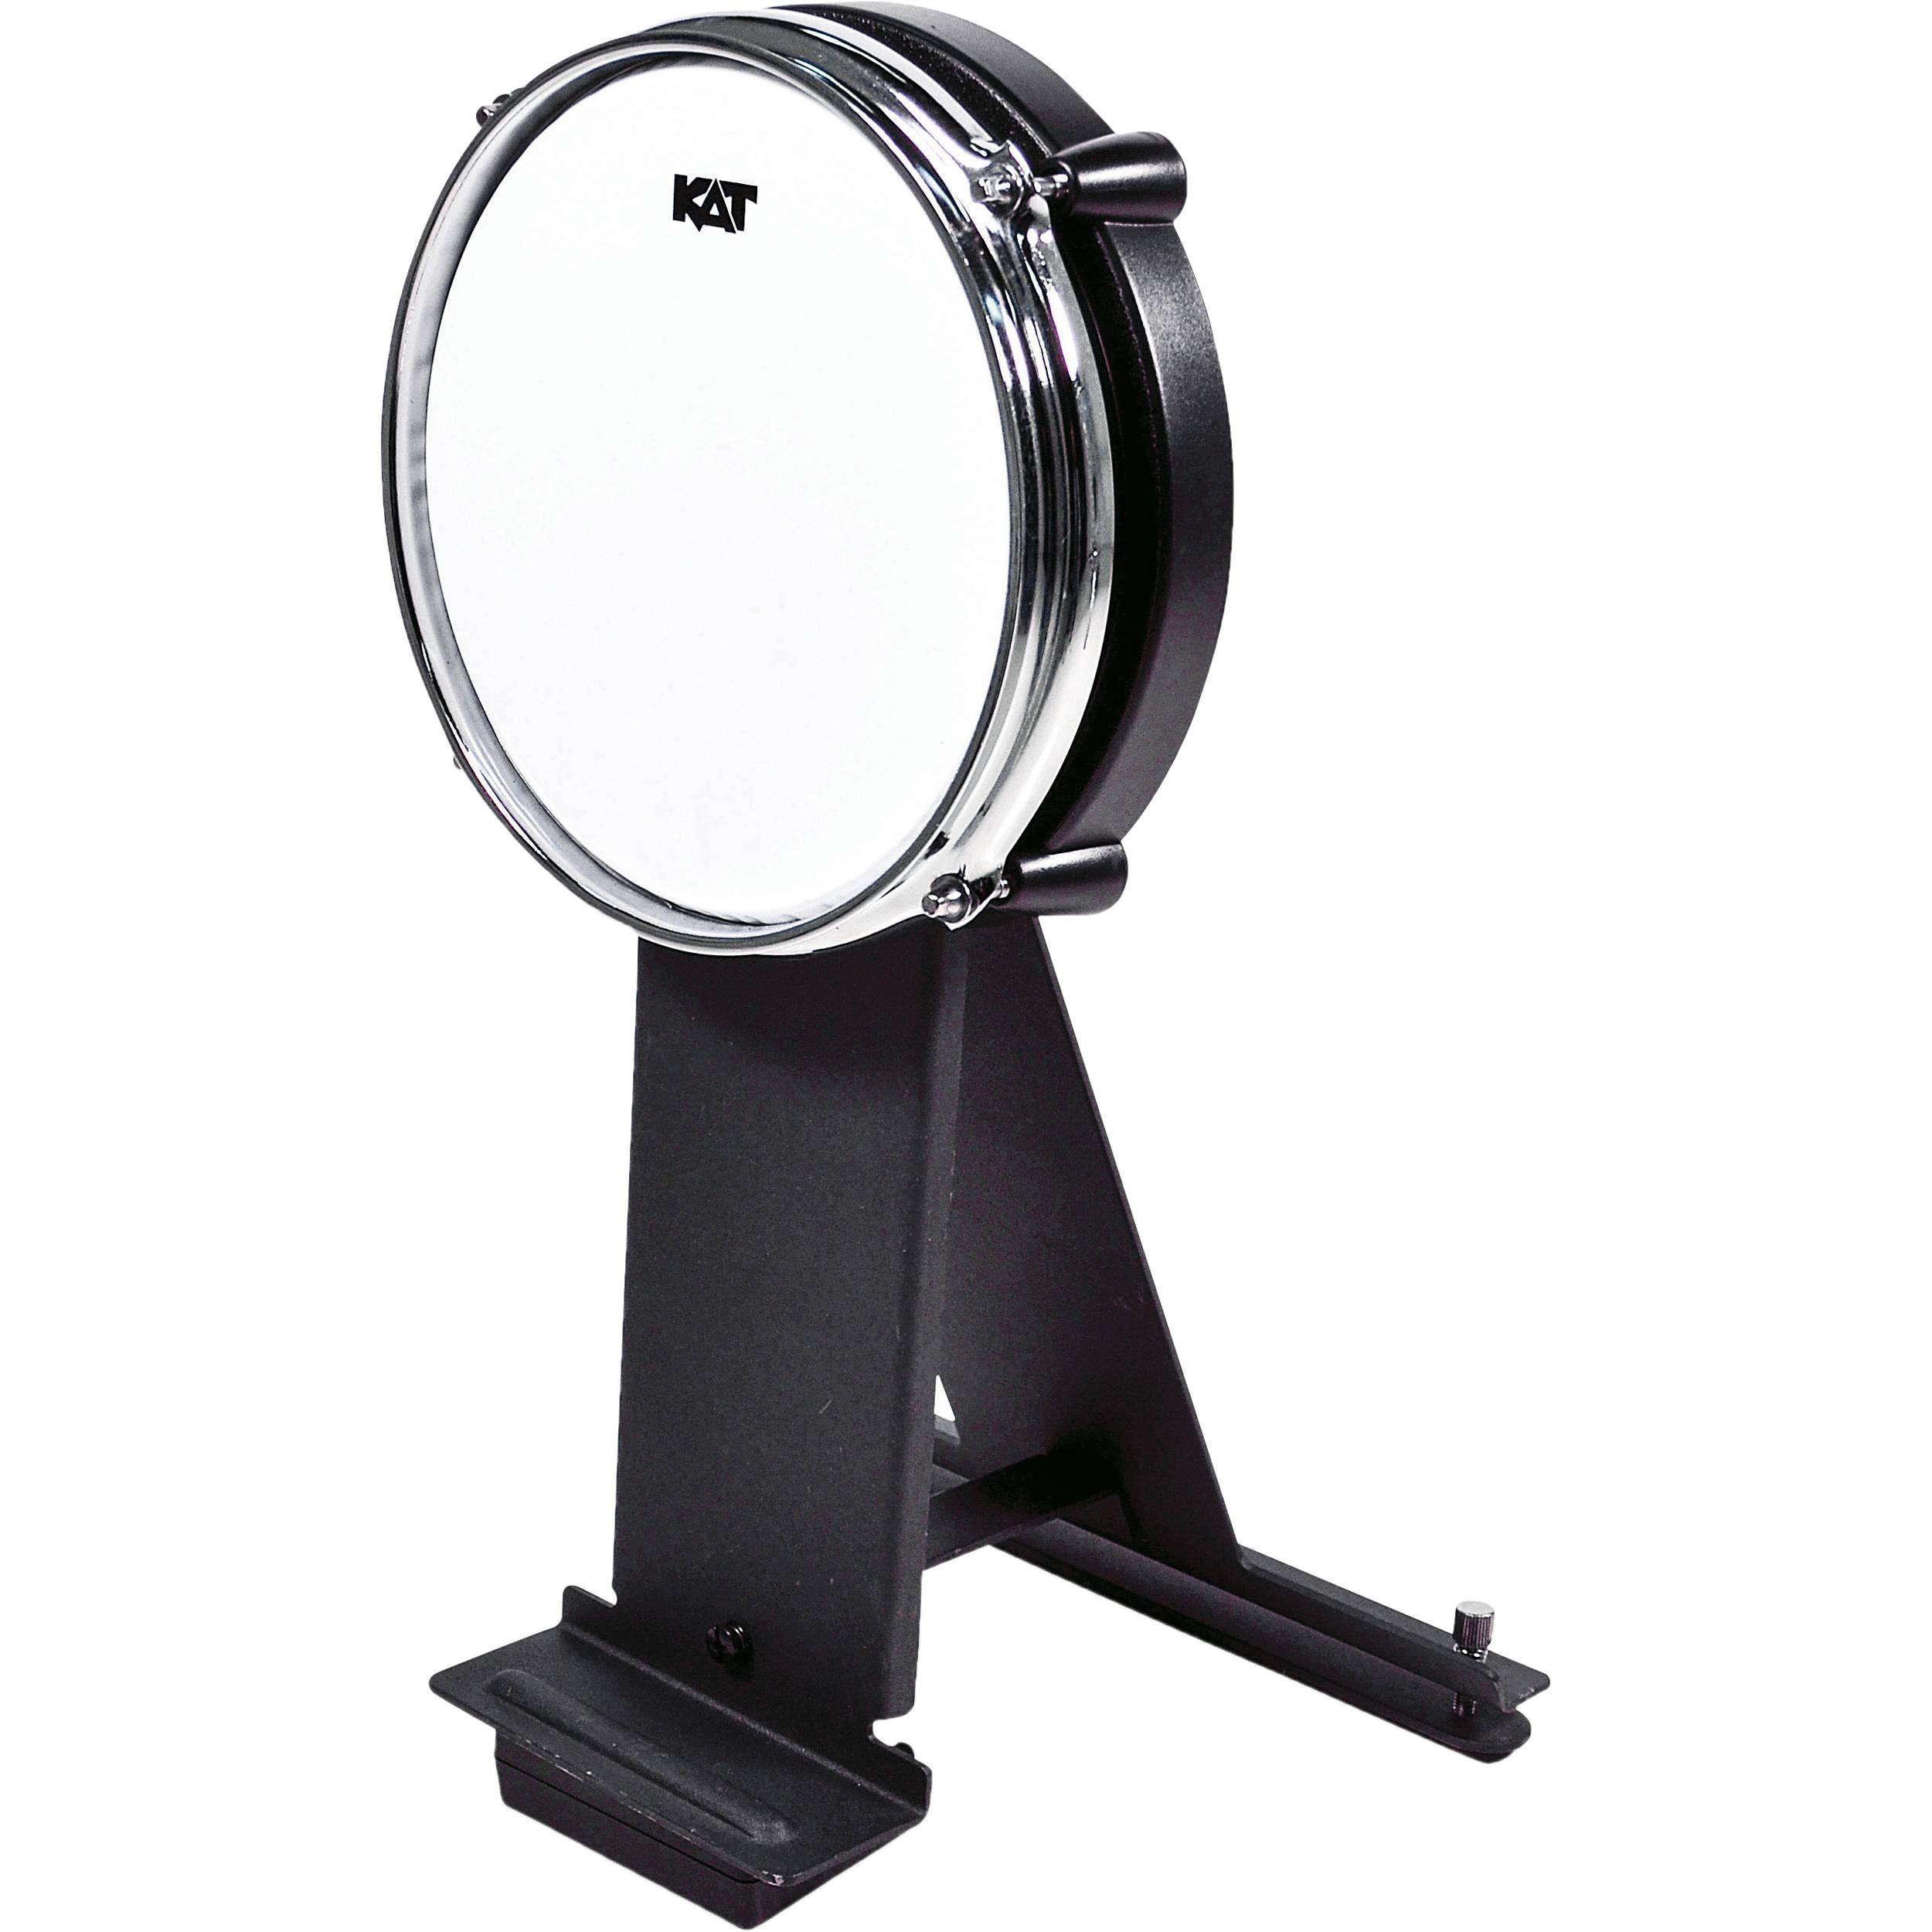 4023ee2180f4 KAT KAT Bass Drum Tower with 8